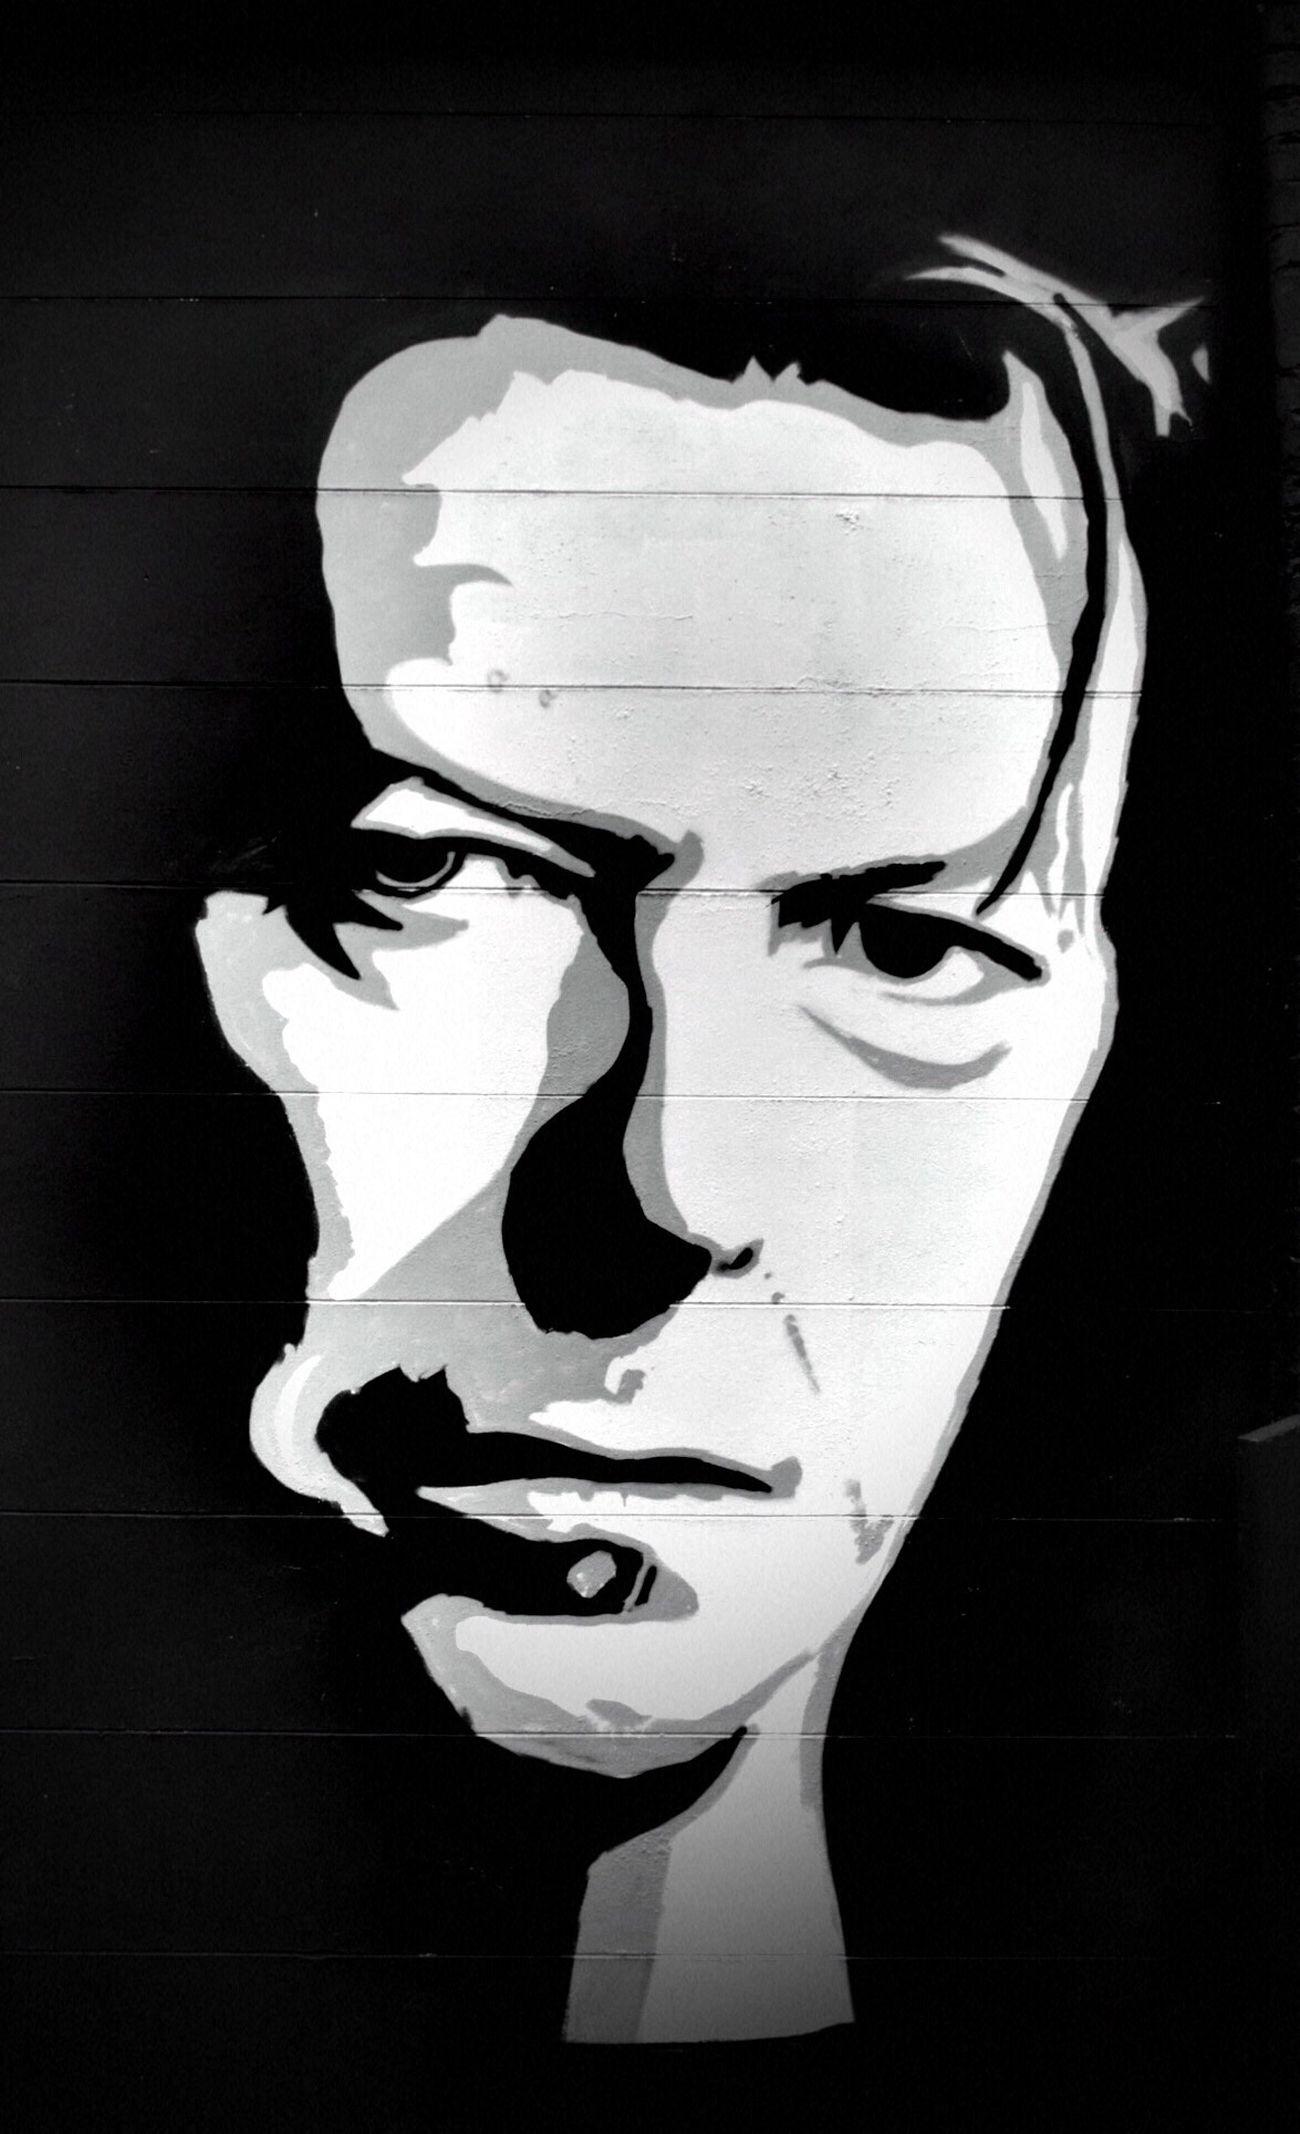 Close-up No People Black Background Streetphotography Streetart Blackandwhite Streetphoto_bw Nikonphotography Nikon Bowie Bowie